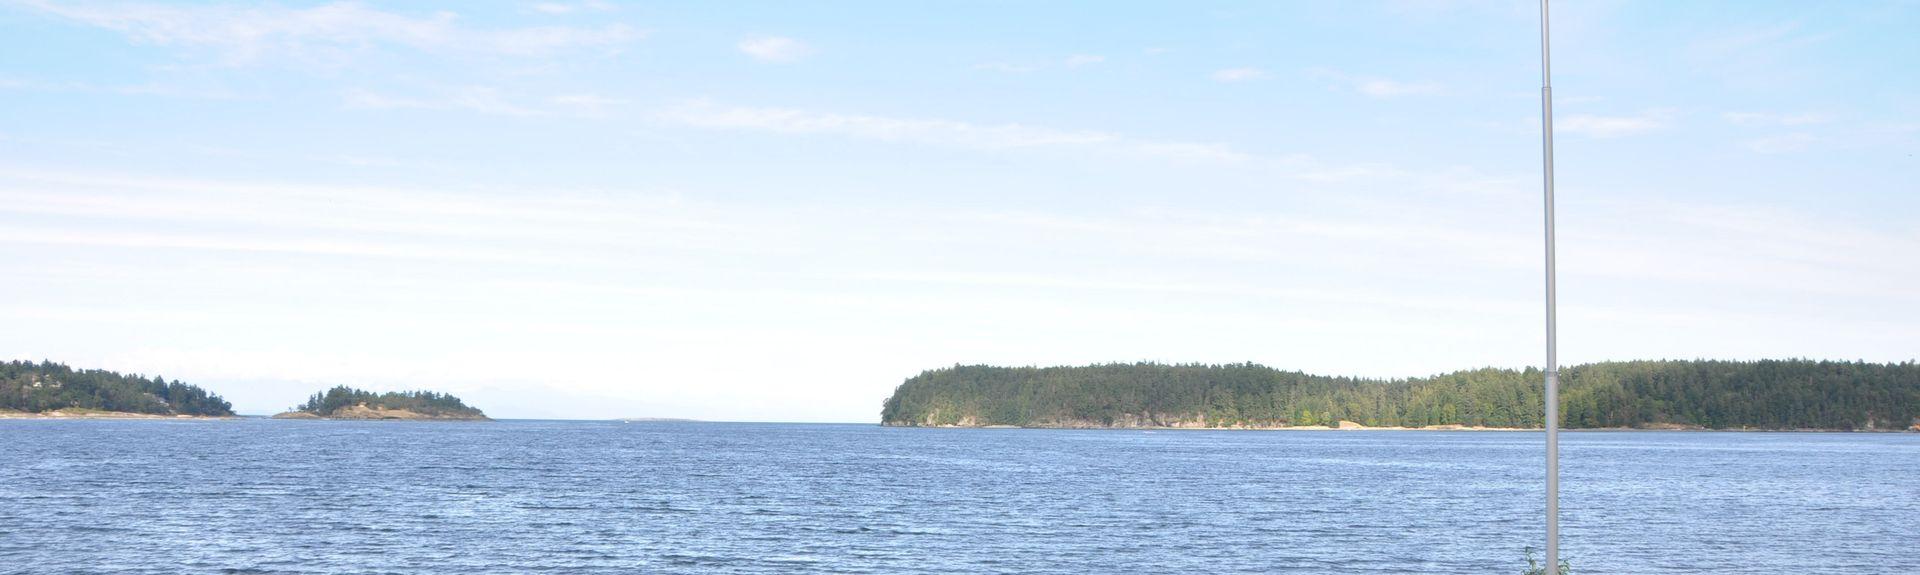 Arbutus Grove Provincial Park, Nanoose Bay, British Columbia, Canada